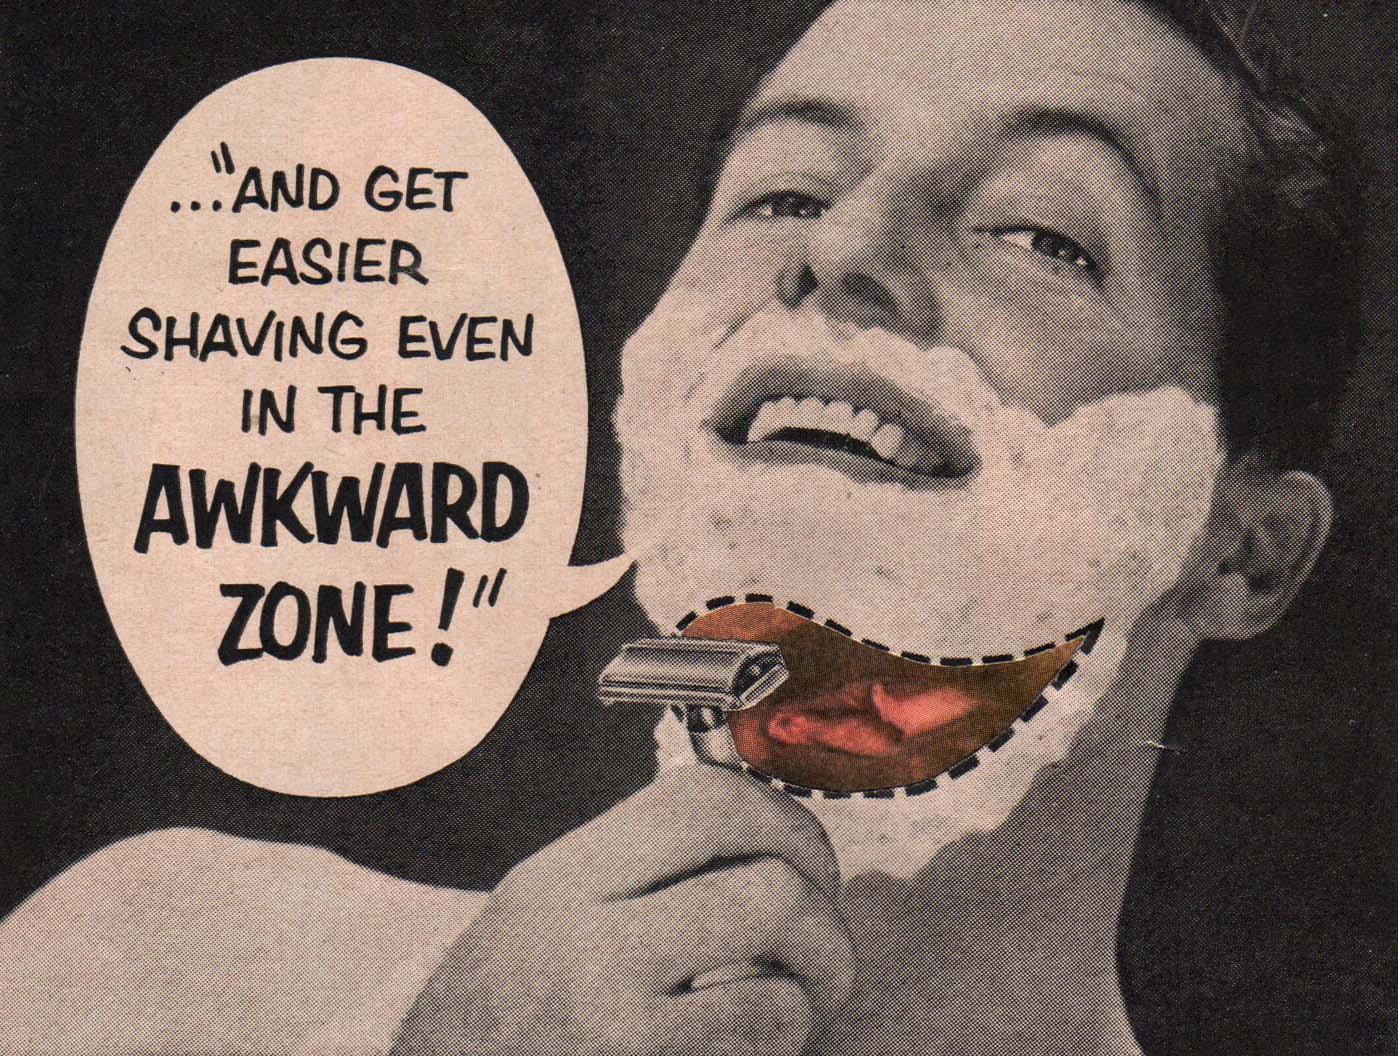 Awkward Zone 2